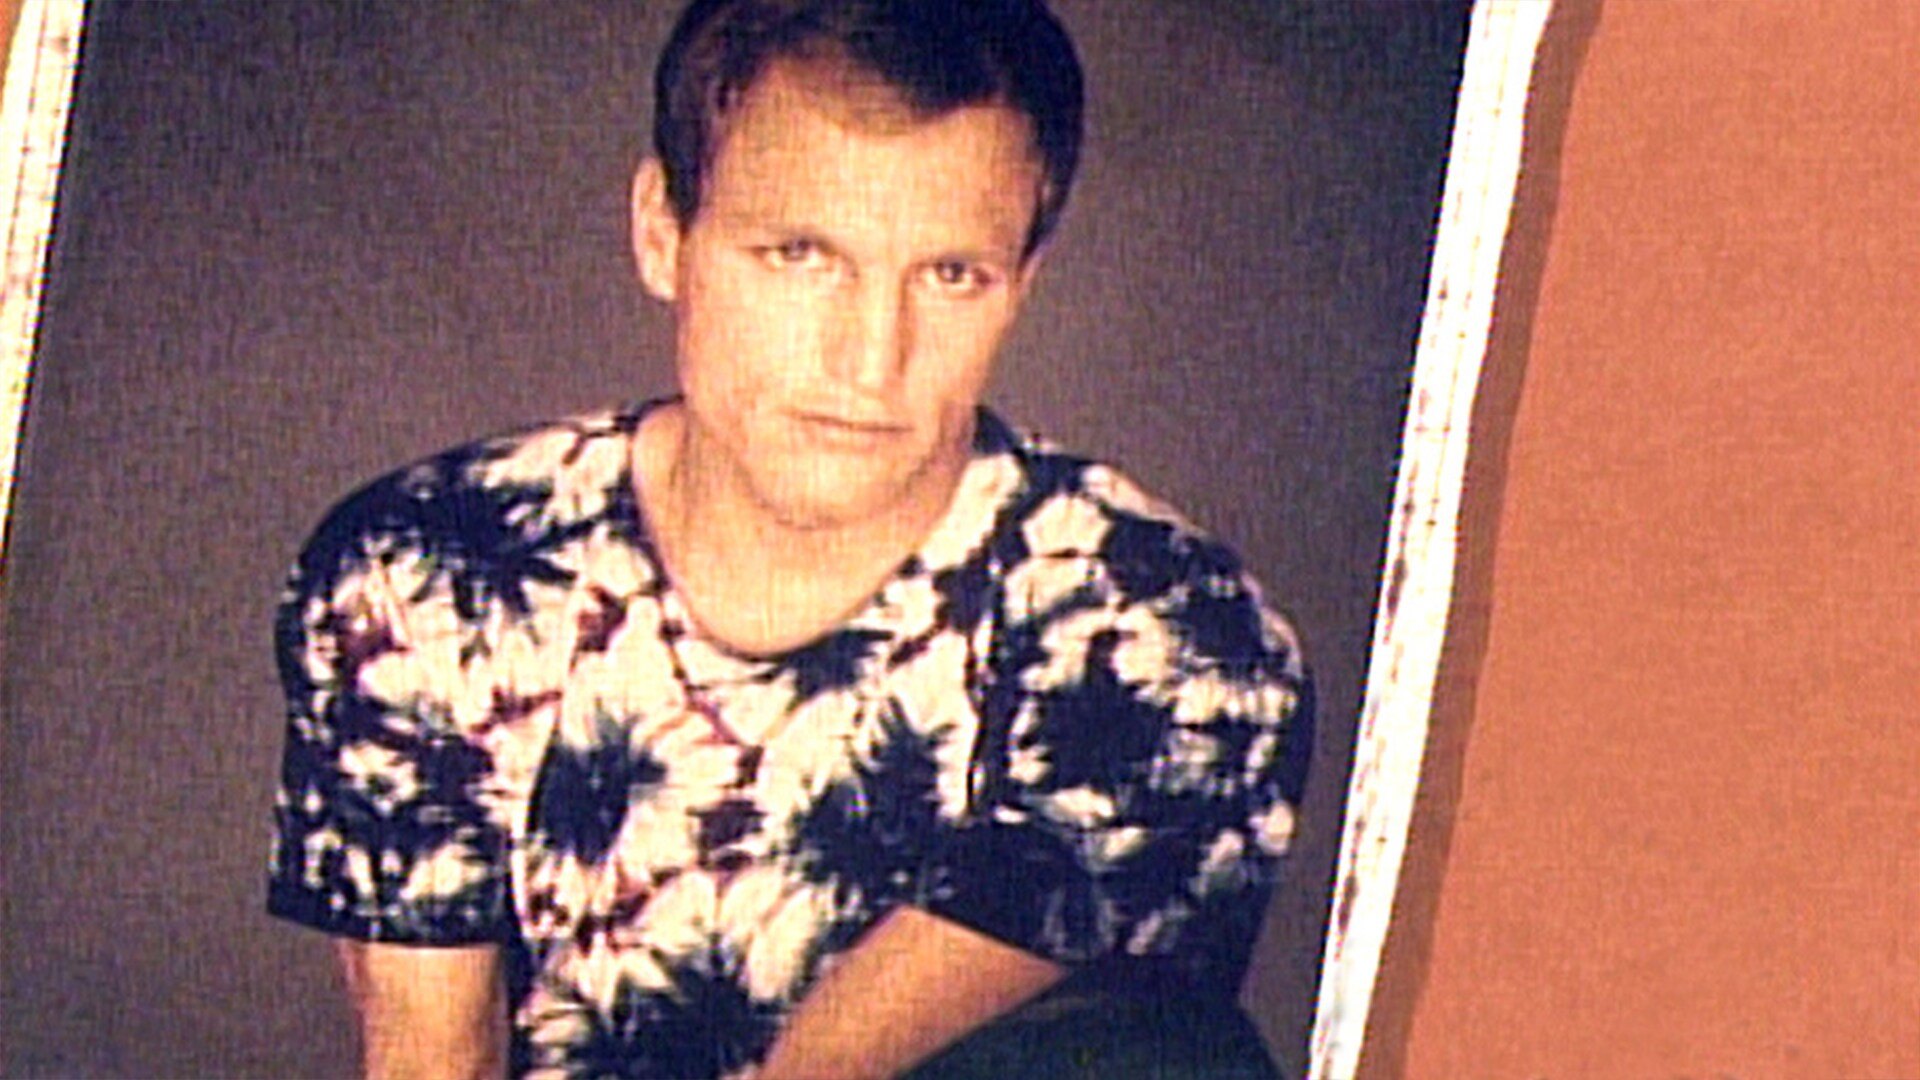 Woody Harrelson: May 16, 1992